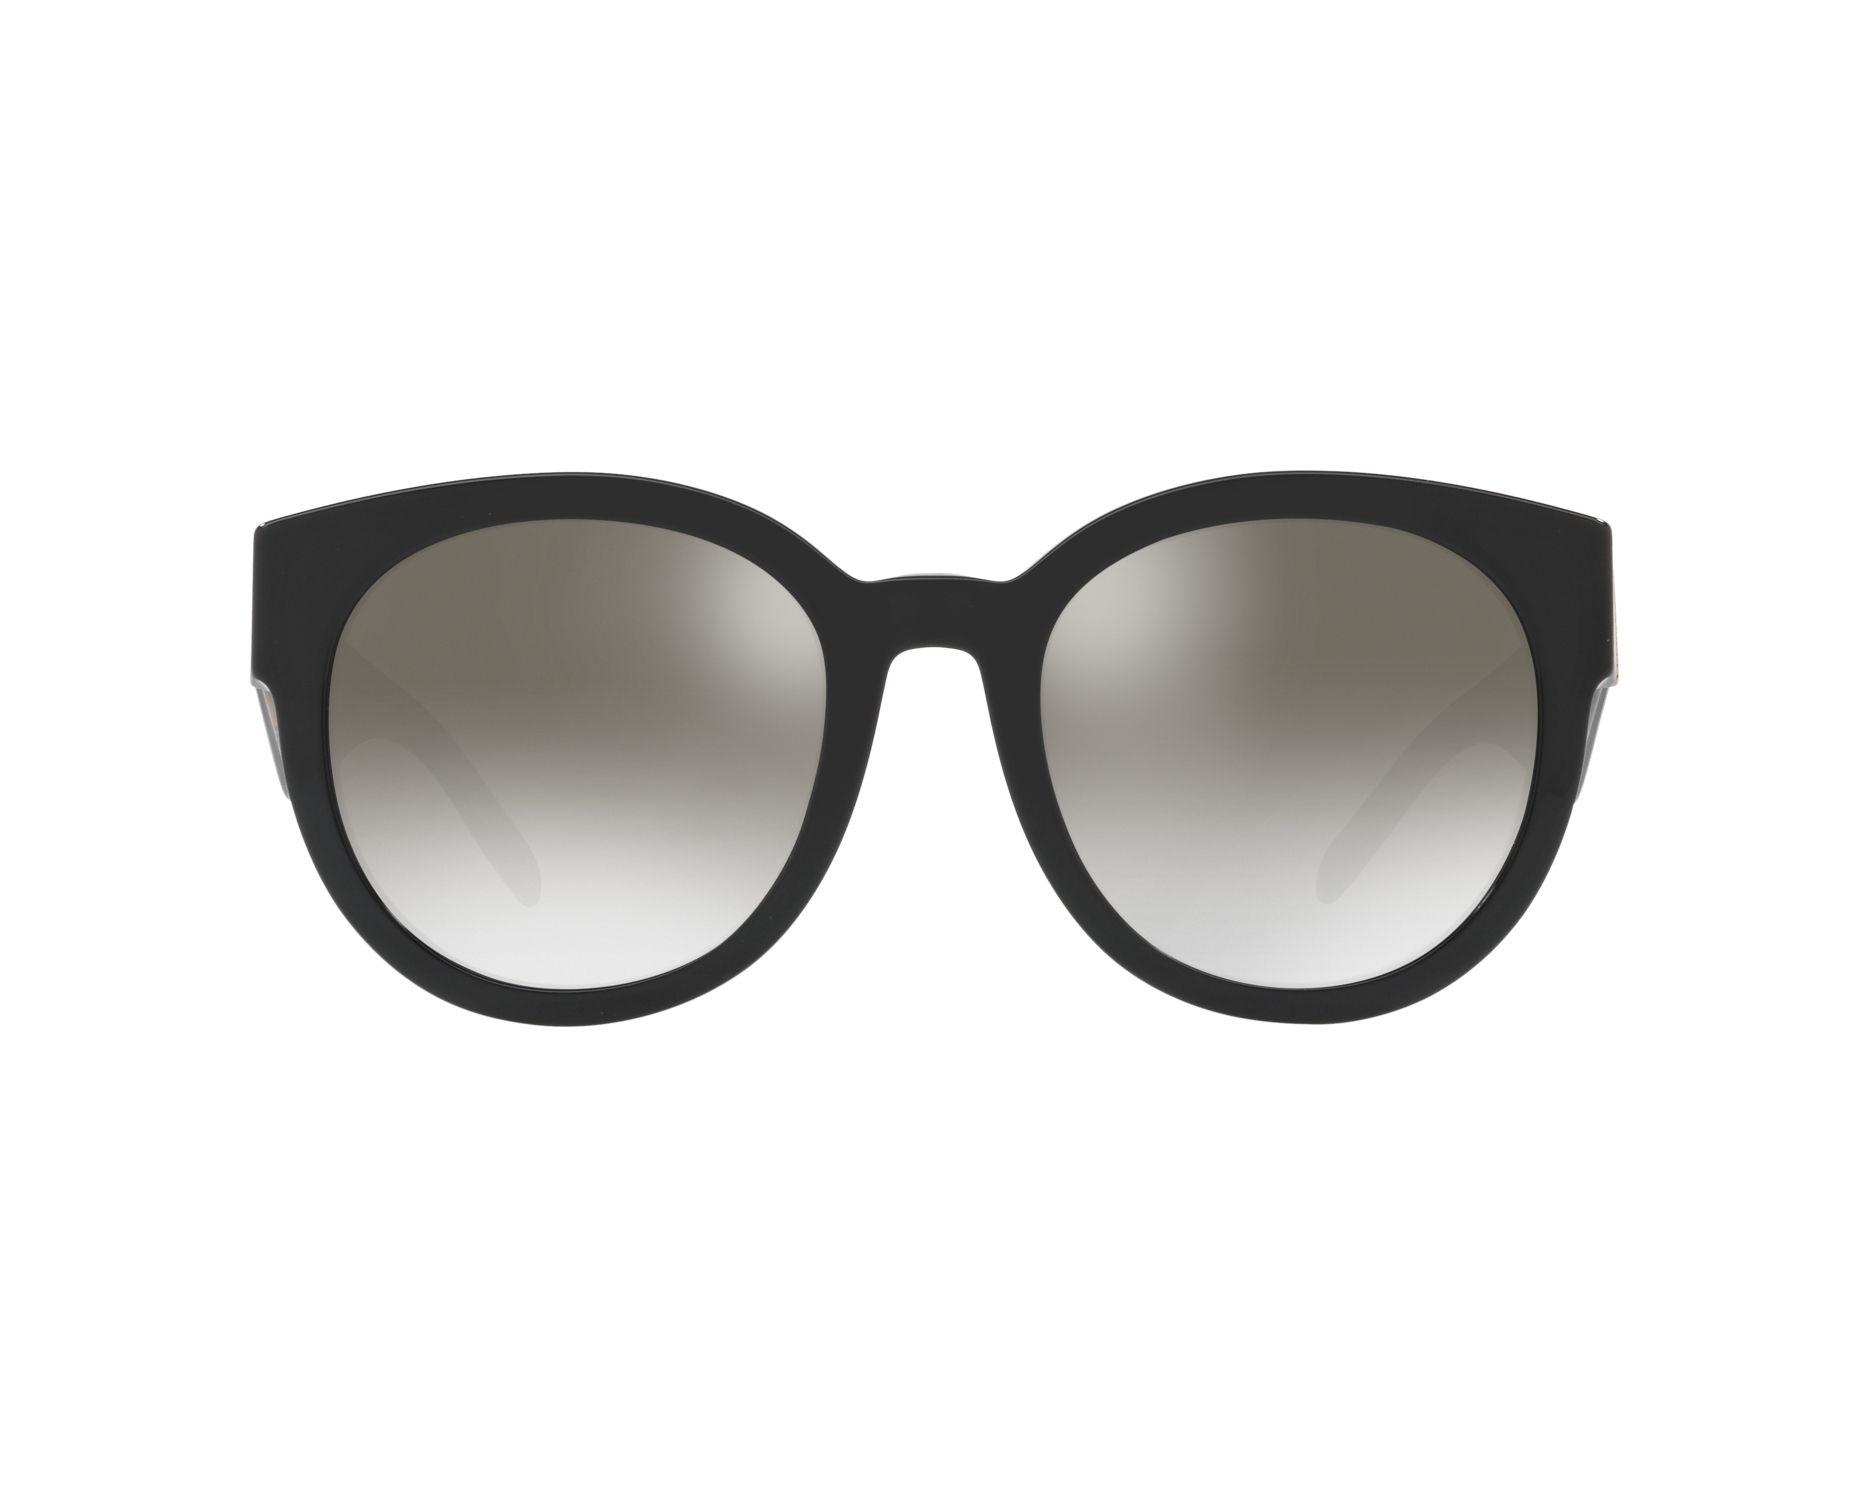 3b17c81c3f66 Sunglasses Burberry BE-4260 36836l 54-21 Black Brown 360 degree view 1